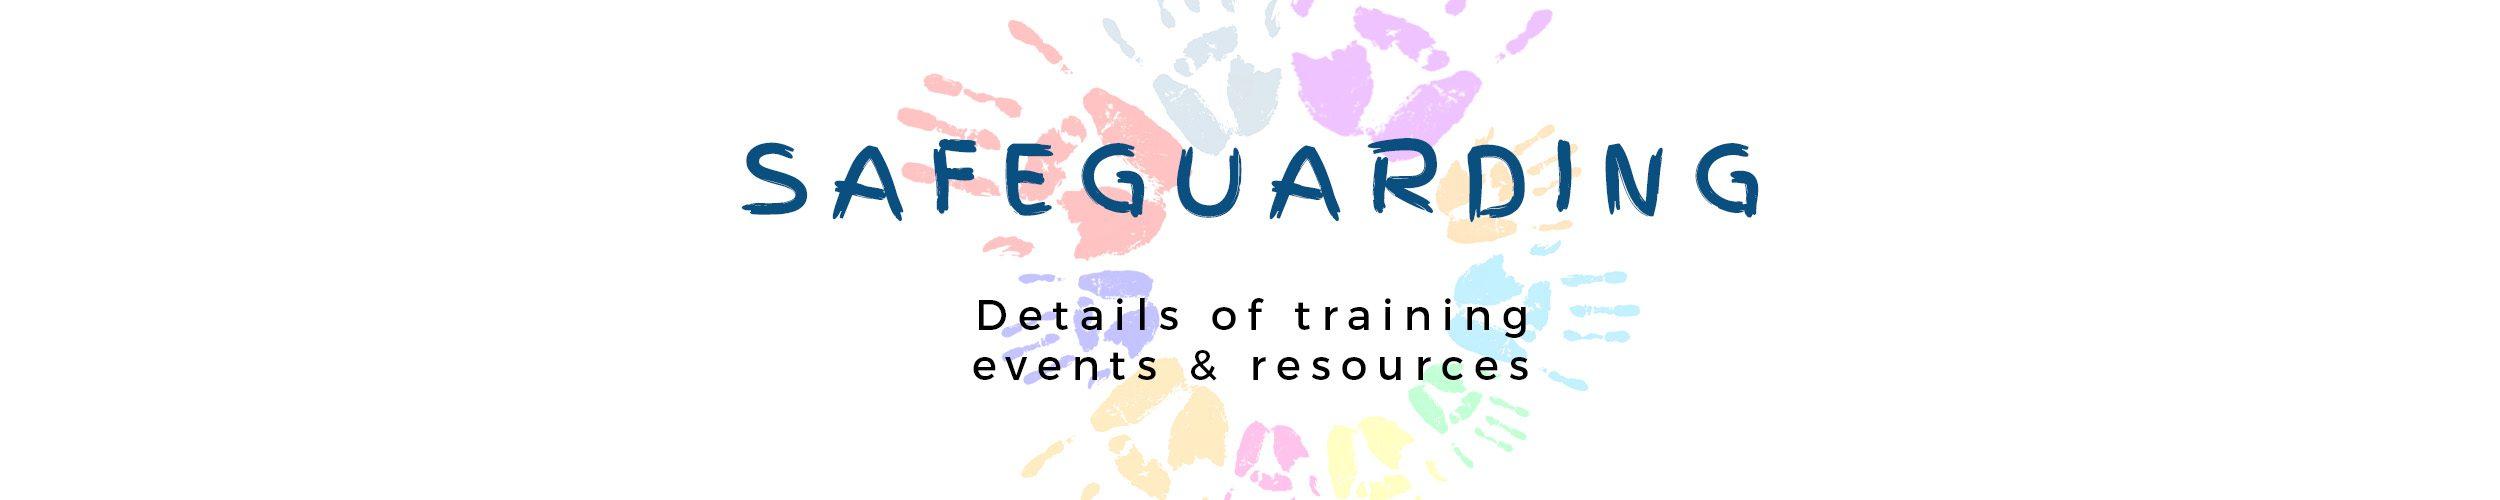 Safeguarding Training